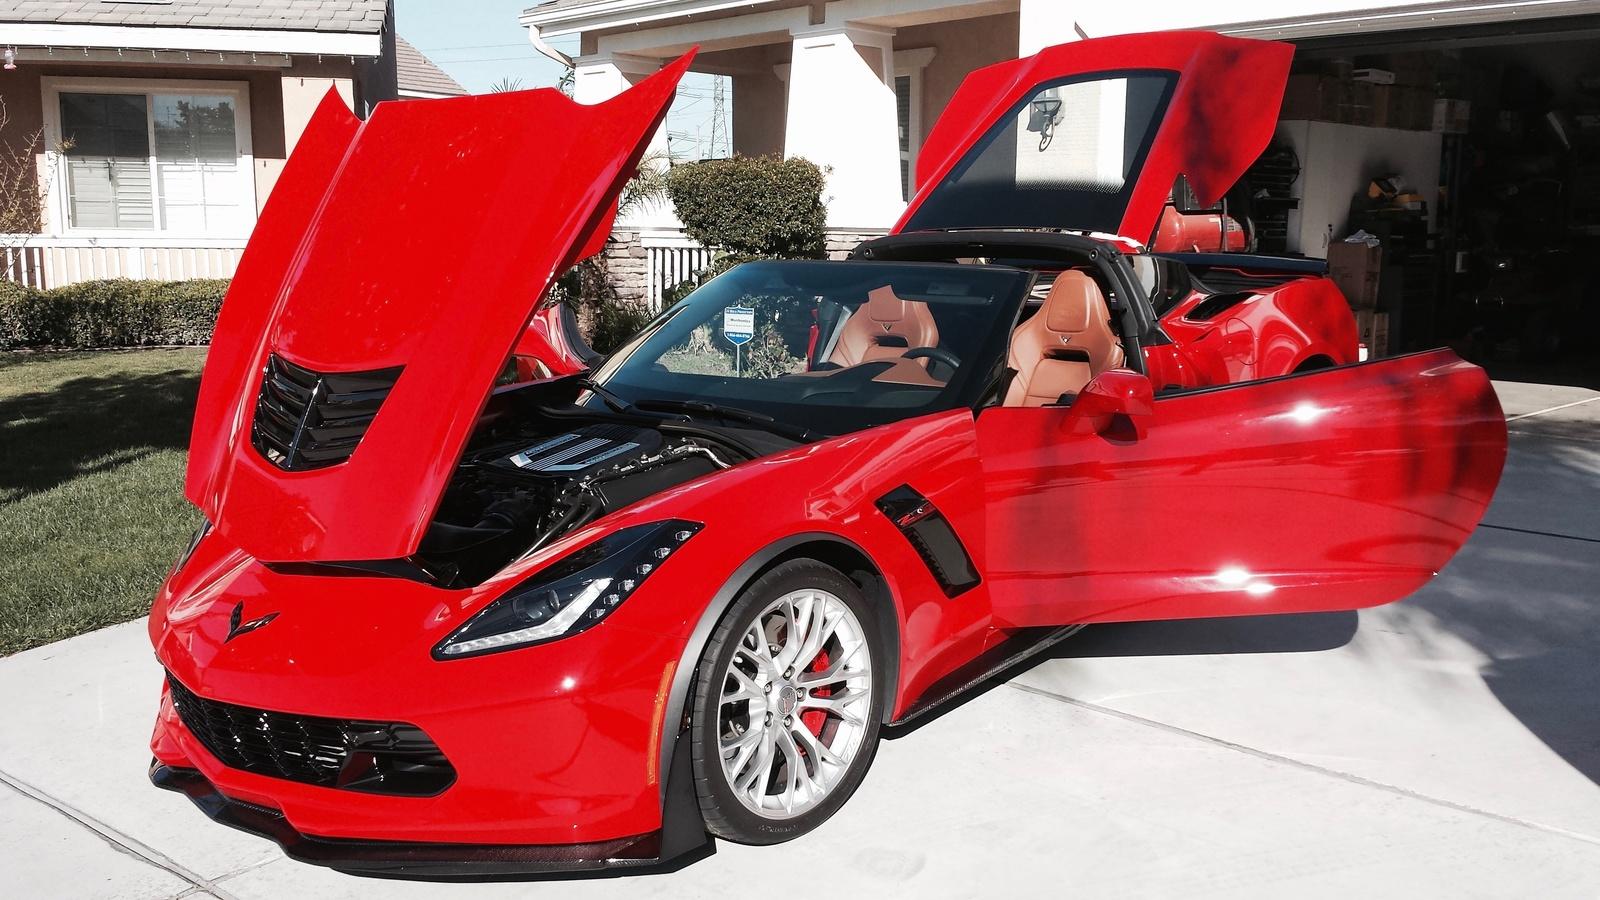 chevrolet corvette questions i have a 2016 z06 2lz it has 7500 miles great condition how. Black Bedroom Furniture Sets. Home Design Ideas